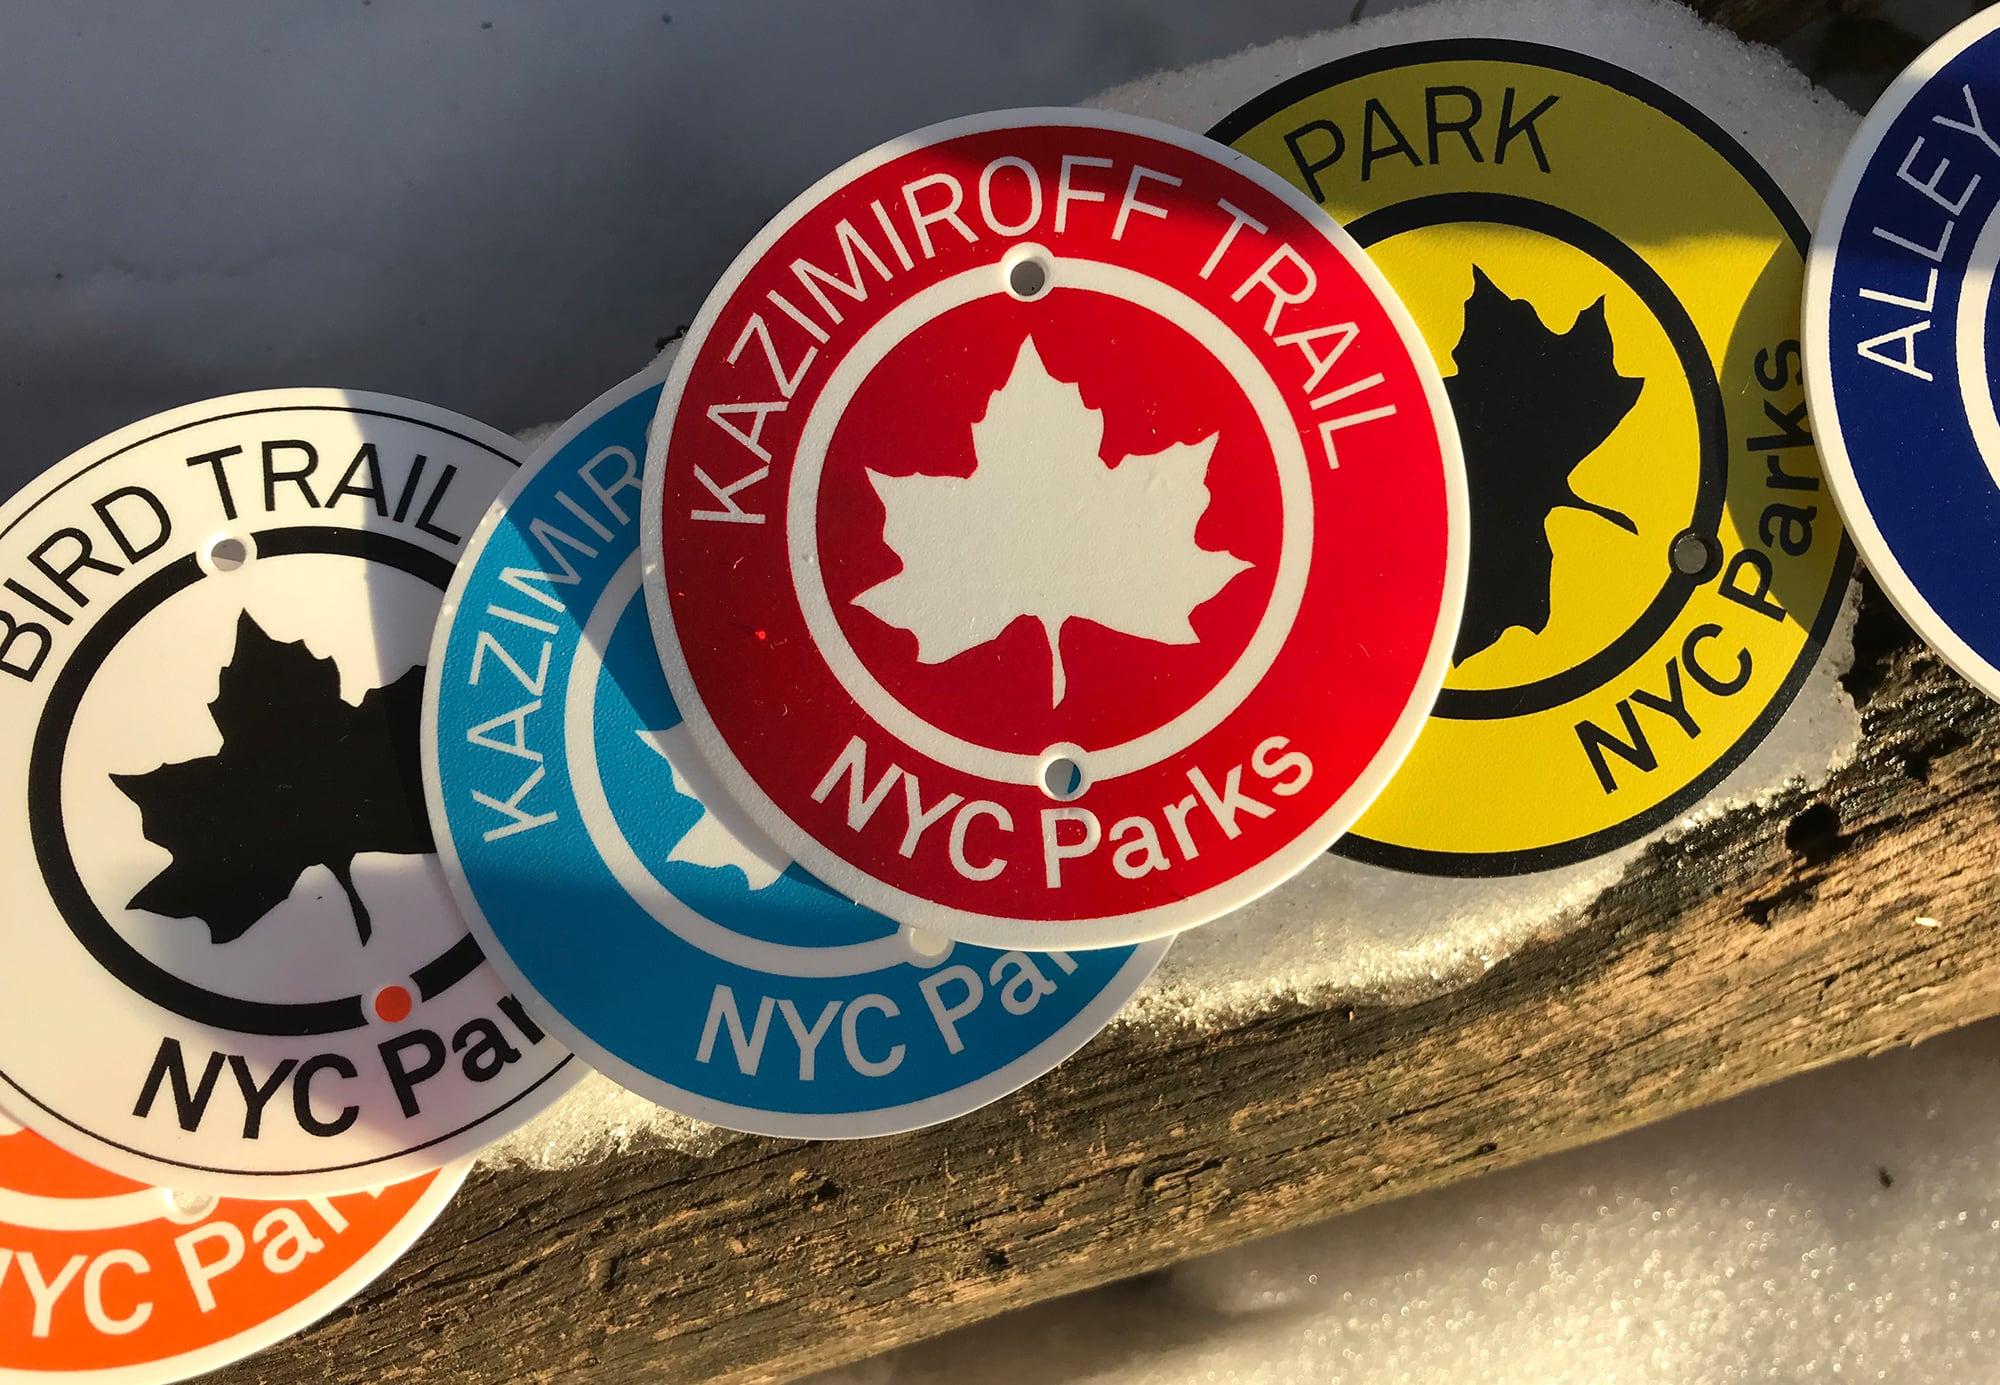 Kazimiroff trail - NYC Parks